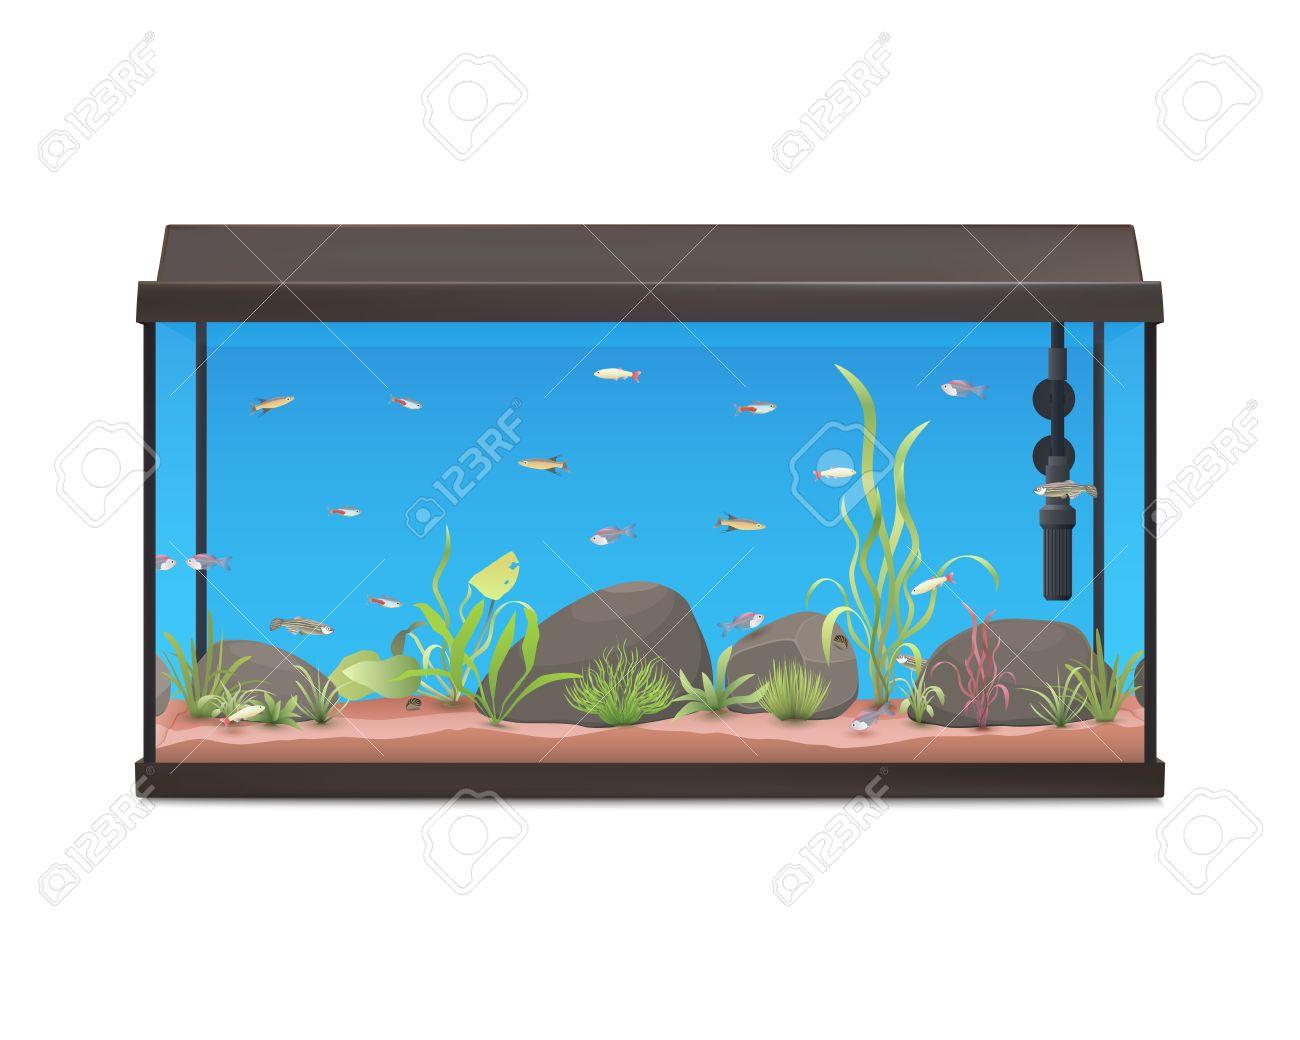 1300x1040 Fish Tank Fish Bowl Clip Art Clipart Image Fishbowl Free